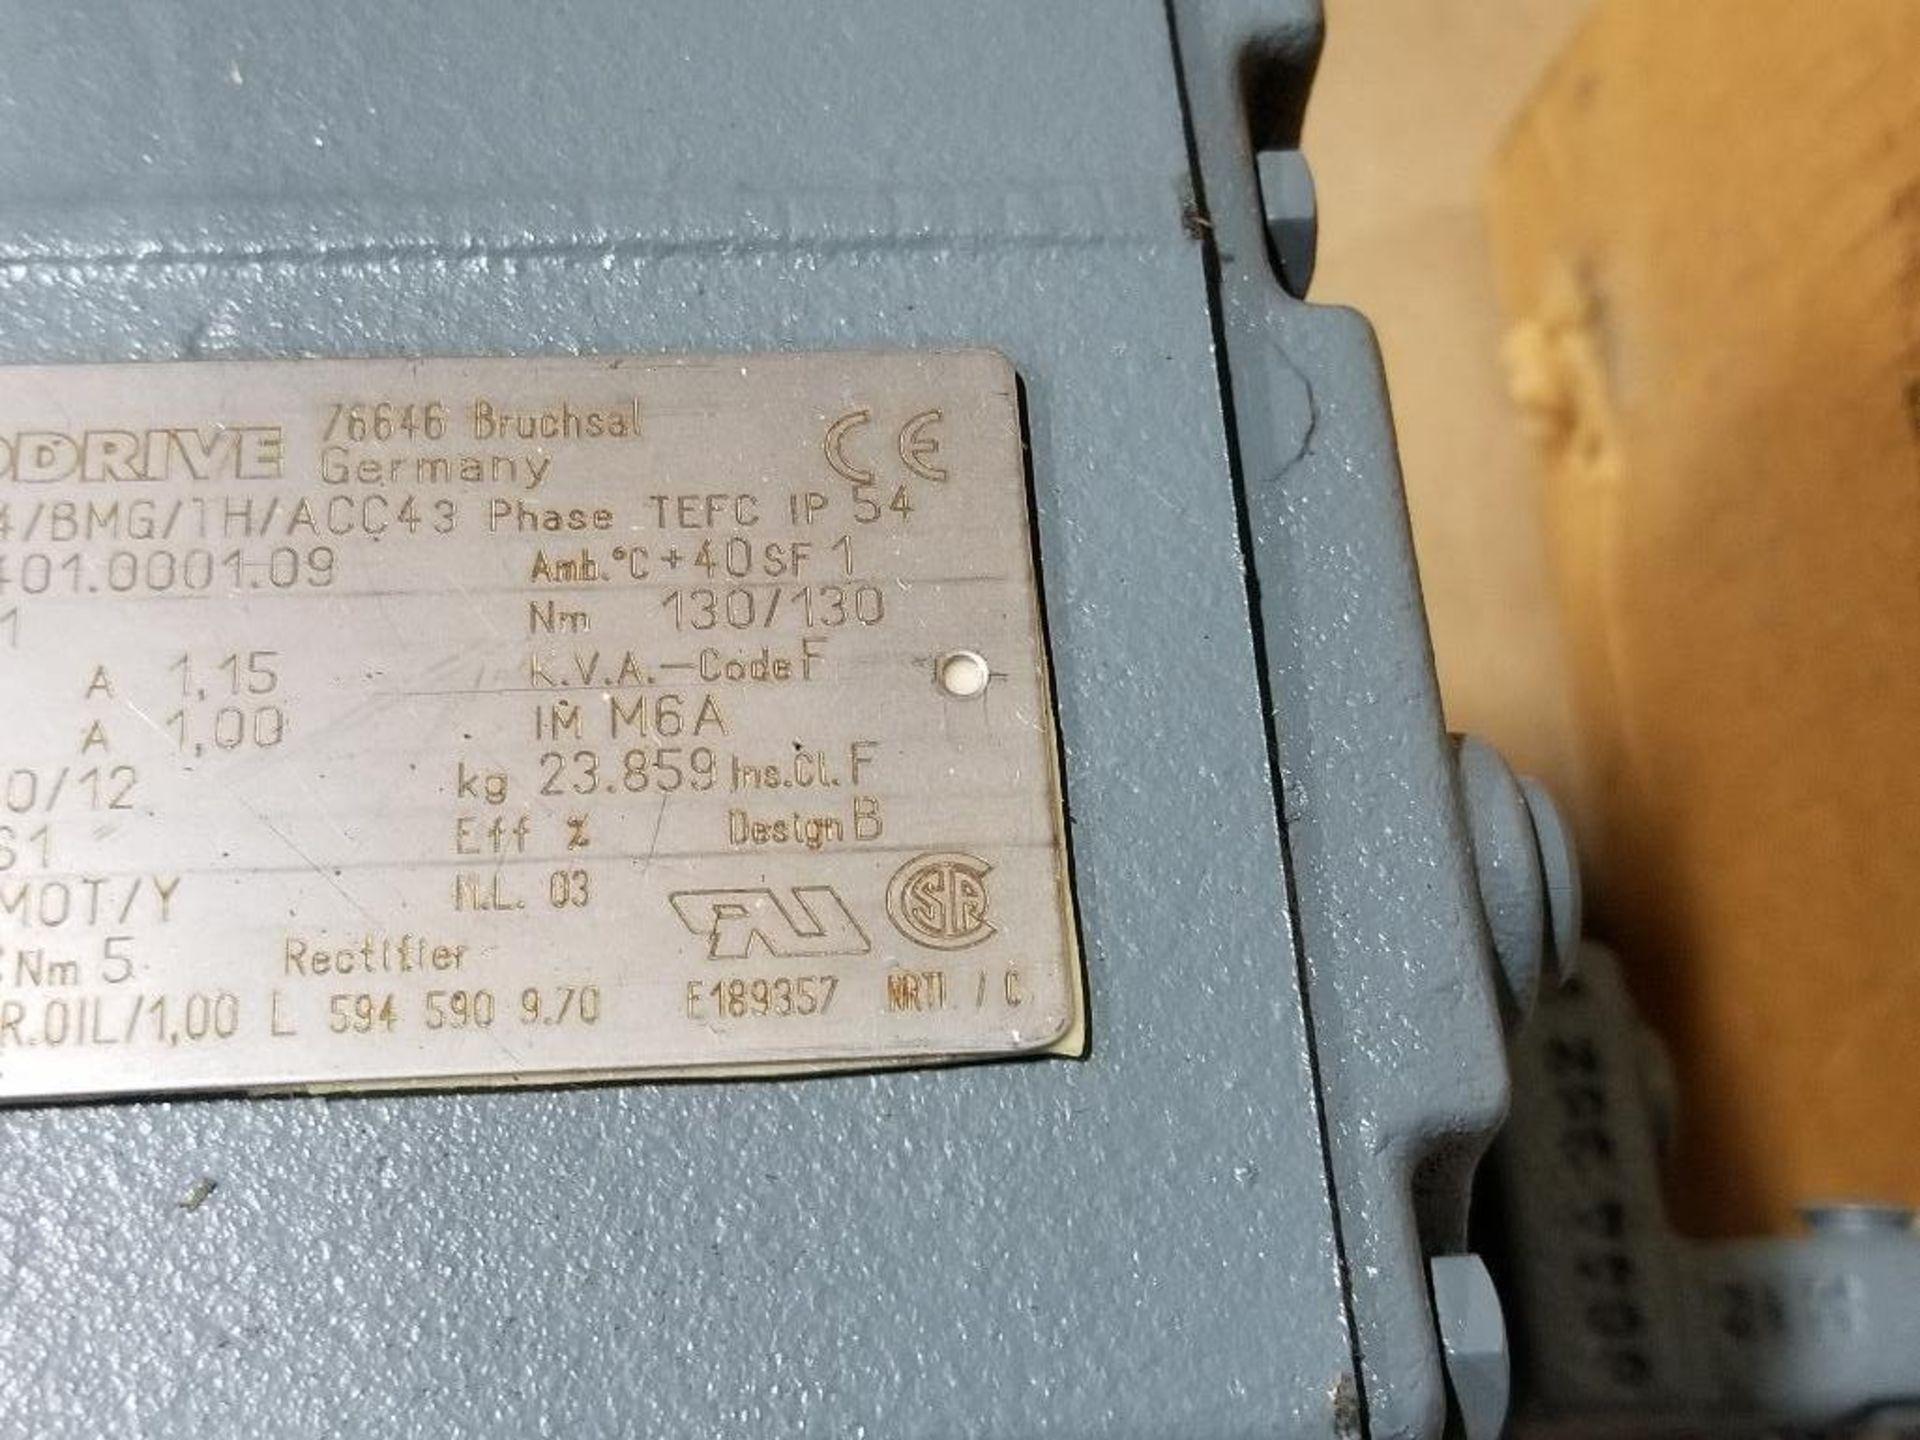 0.37kW Sew-Eurodrive Type-HS40 Motor. 01.1276862401.0001.09 400/460V, 1380/1680RPM. - Image 4 of 5